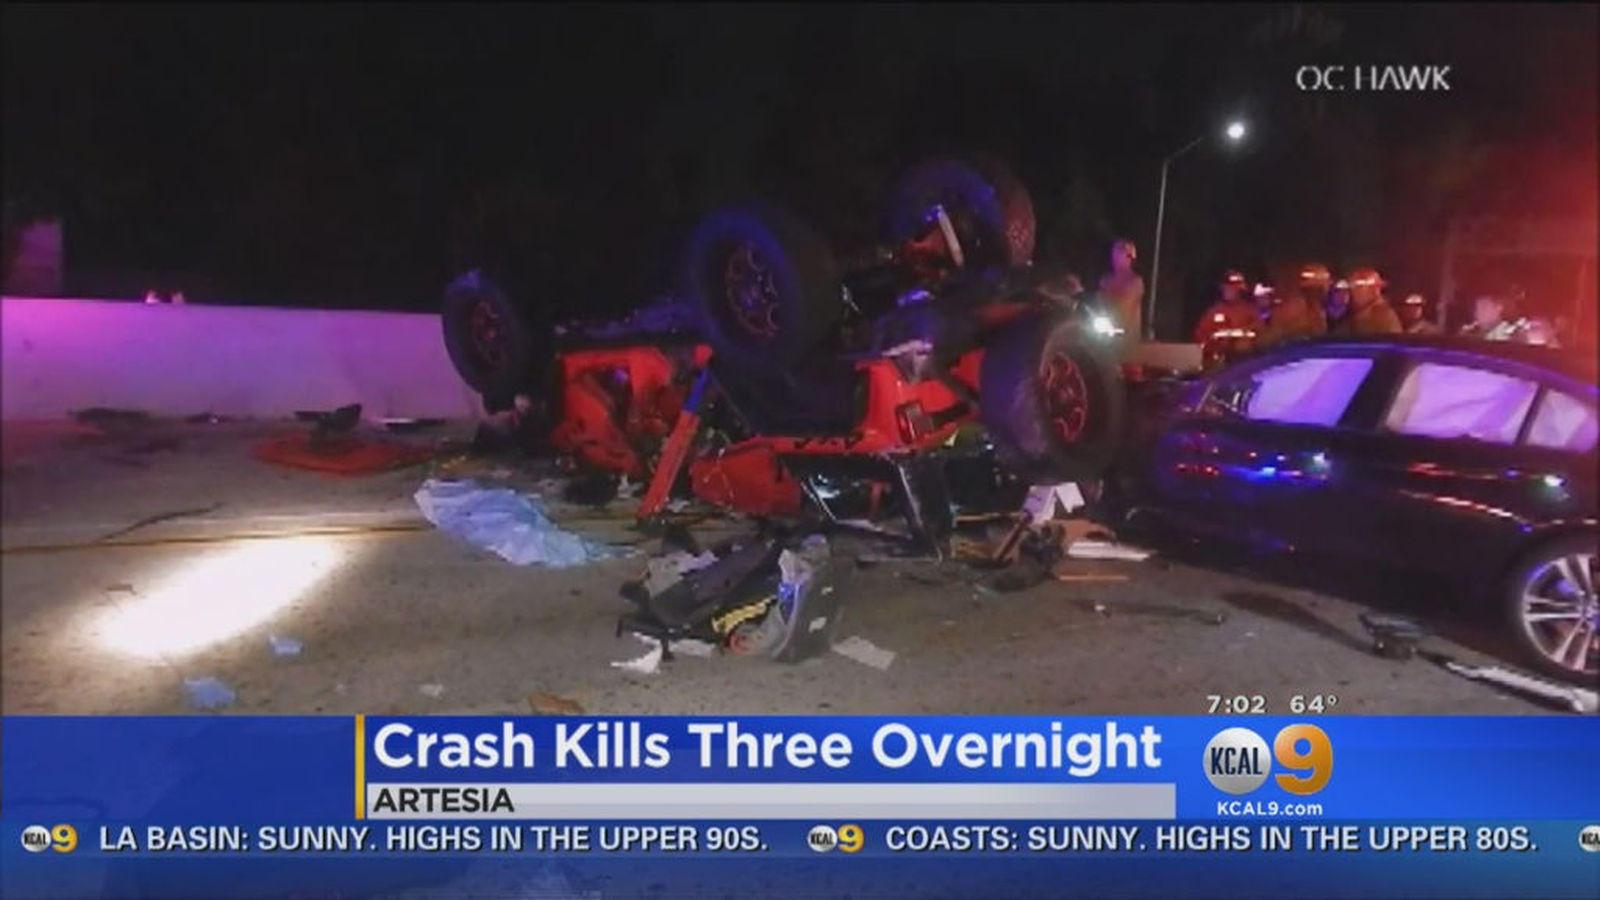 Crash on 91 Freeway in Artesia kills man and two children - News